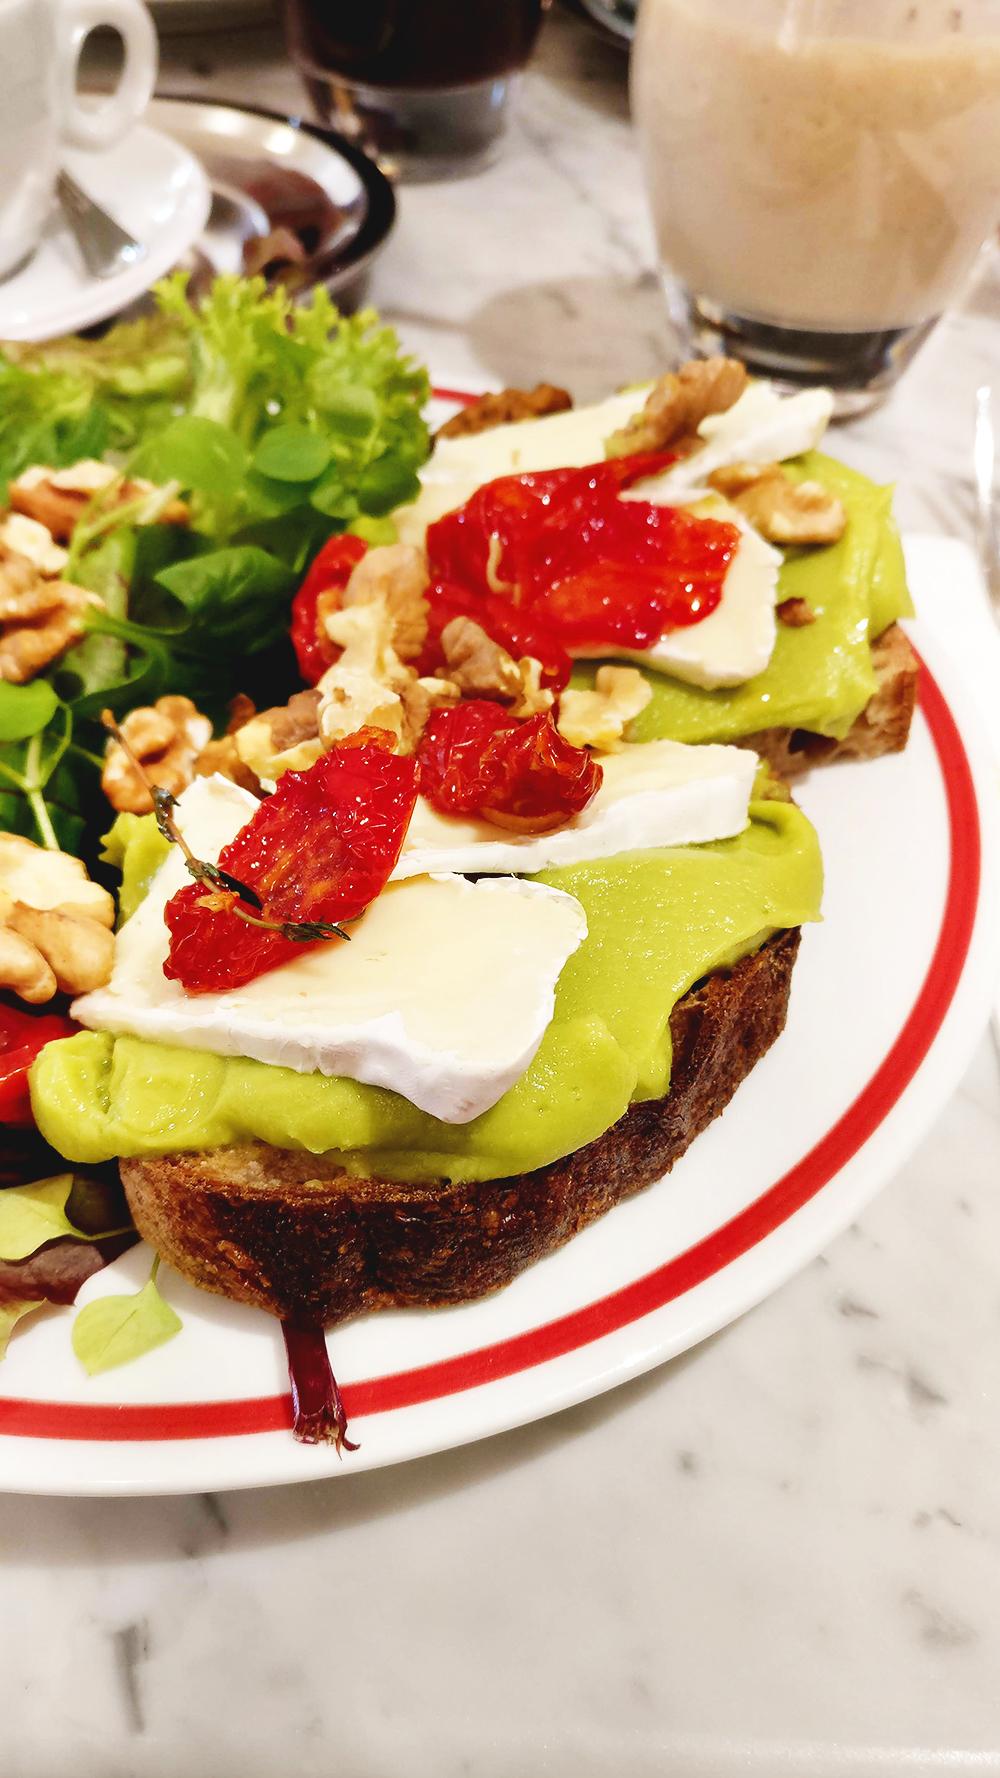 Avocado toast in Börze Café and Restaurant - Avocado toast lover's guide to Budapest, Hungary | Aliz's Wonderland #Budapest #Hungary #travel #avocadotoast #foodie #Budapestfoodguide